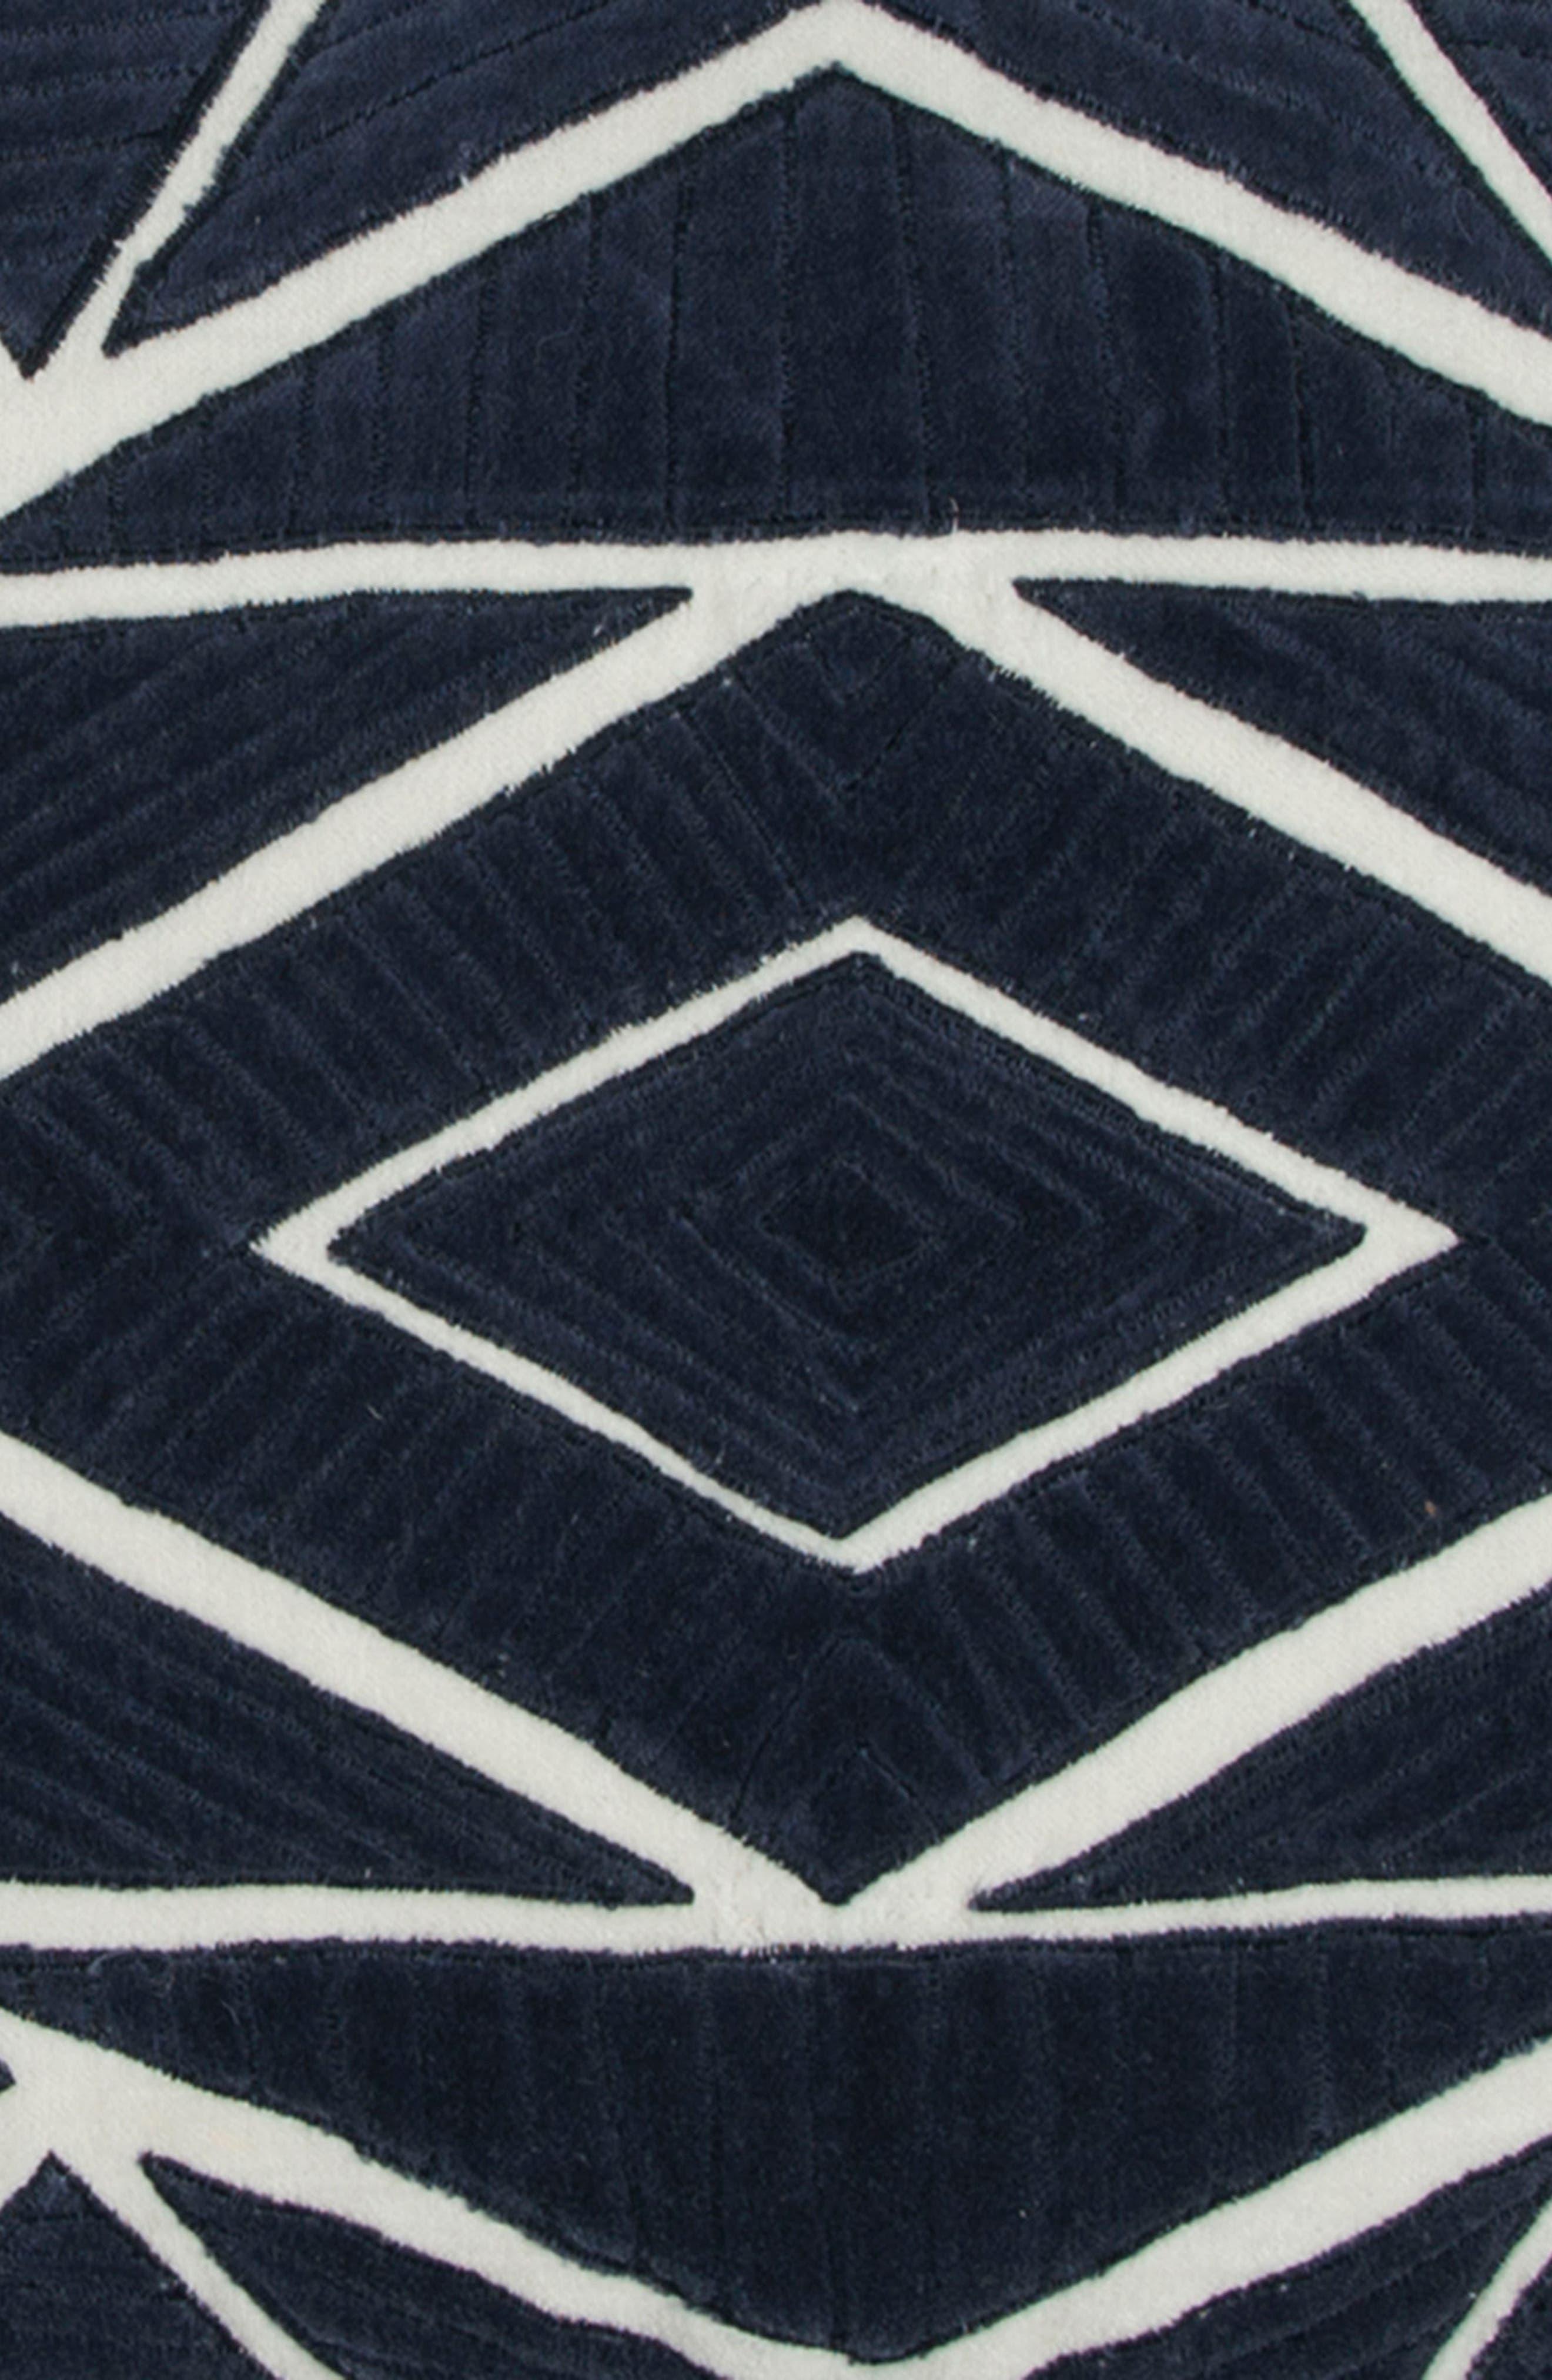 Geometric Accent Pillow,                             Alternate thumbnail 2, color,                             Indigo